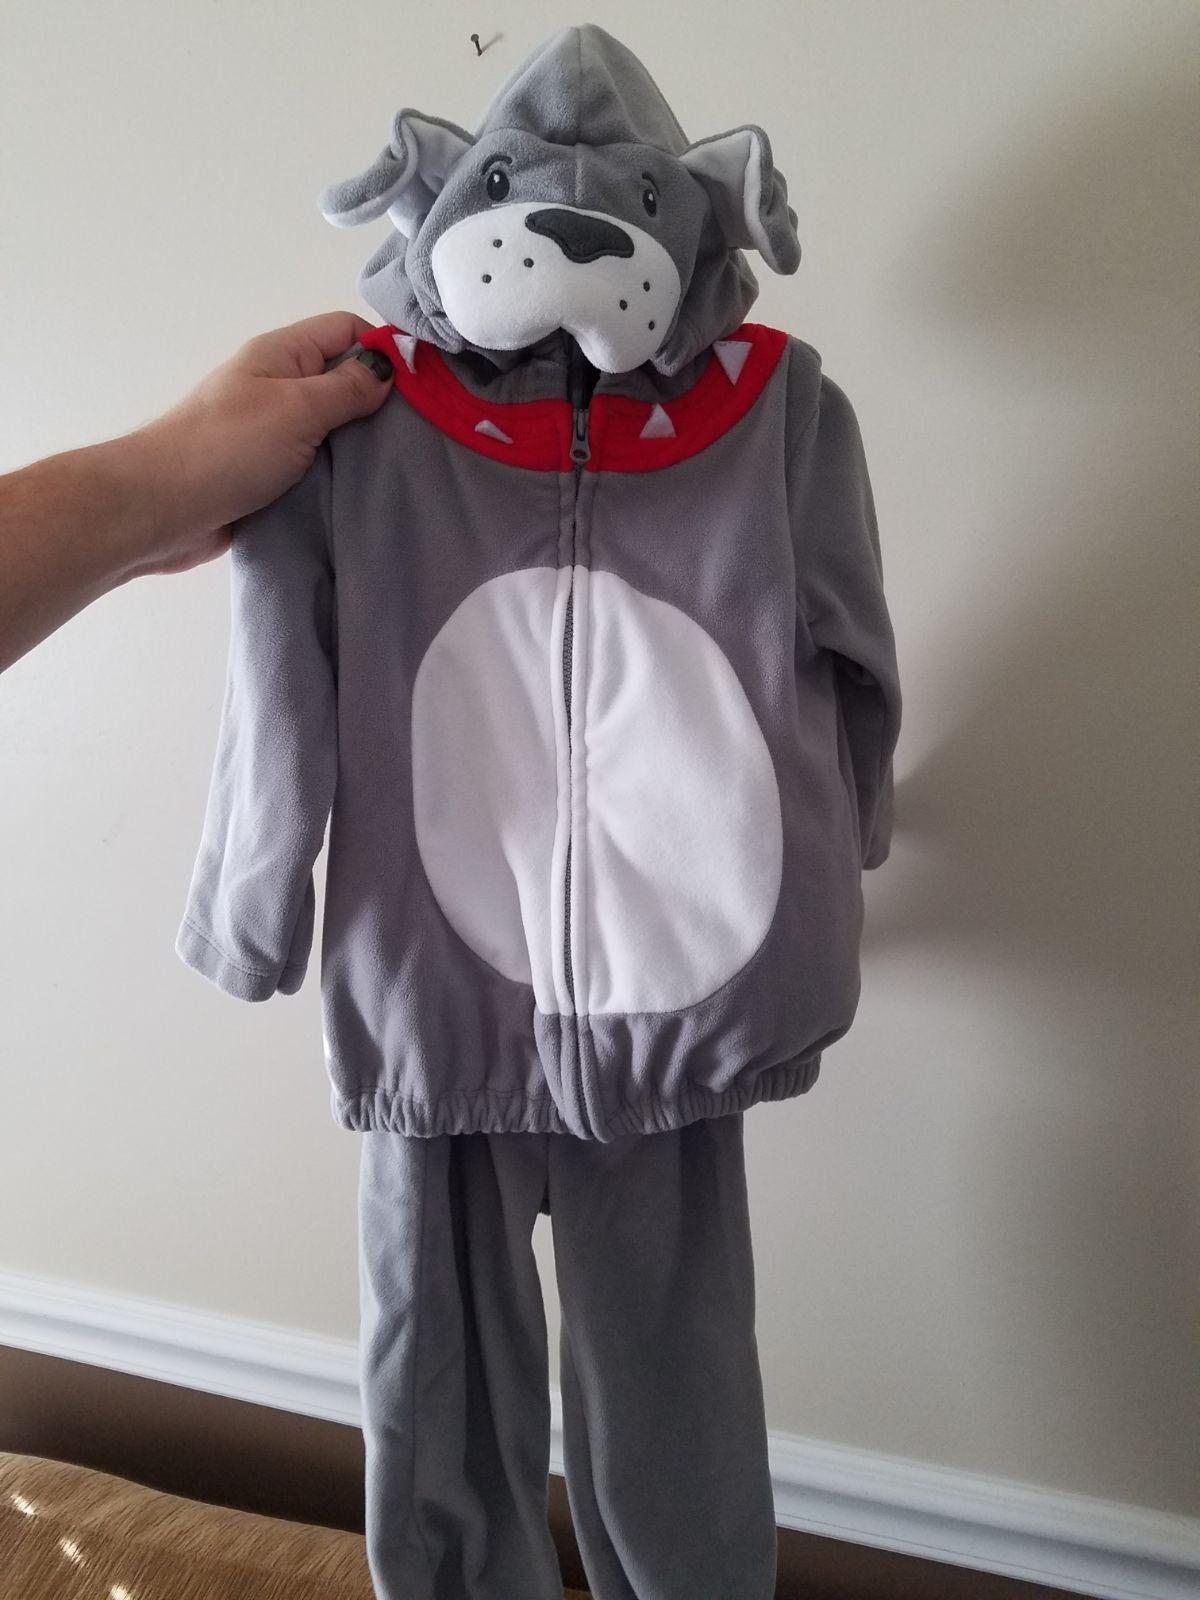 Next Year's Halloween Costume! Size 18 m